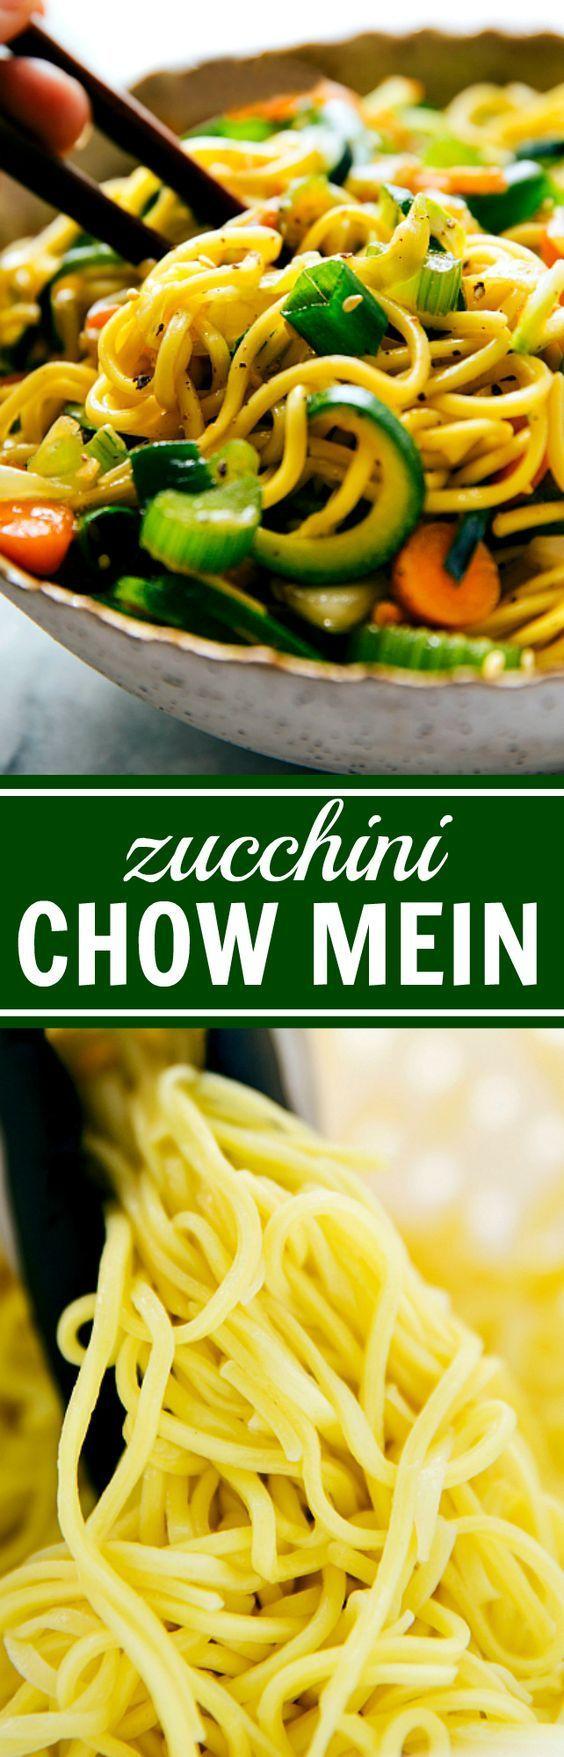 Easy Chow Mein with Spiralized Zucchini